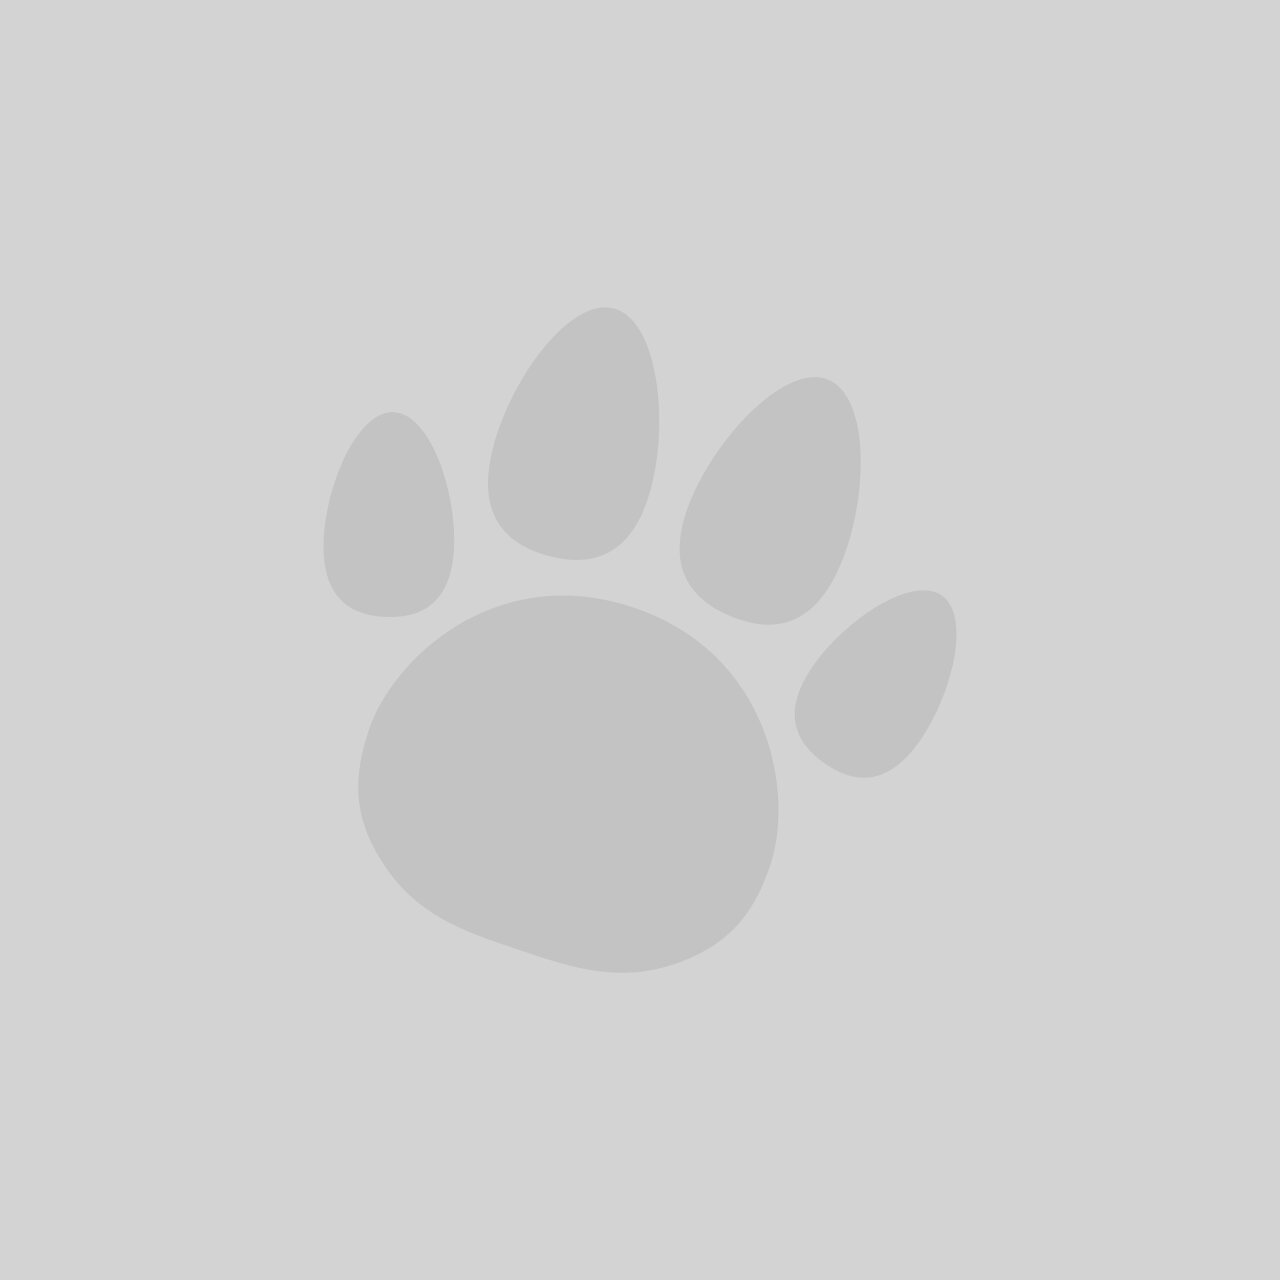 Beaphar Dog & Cat Toothpaste